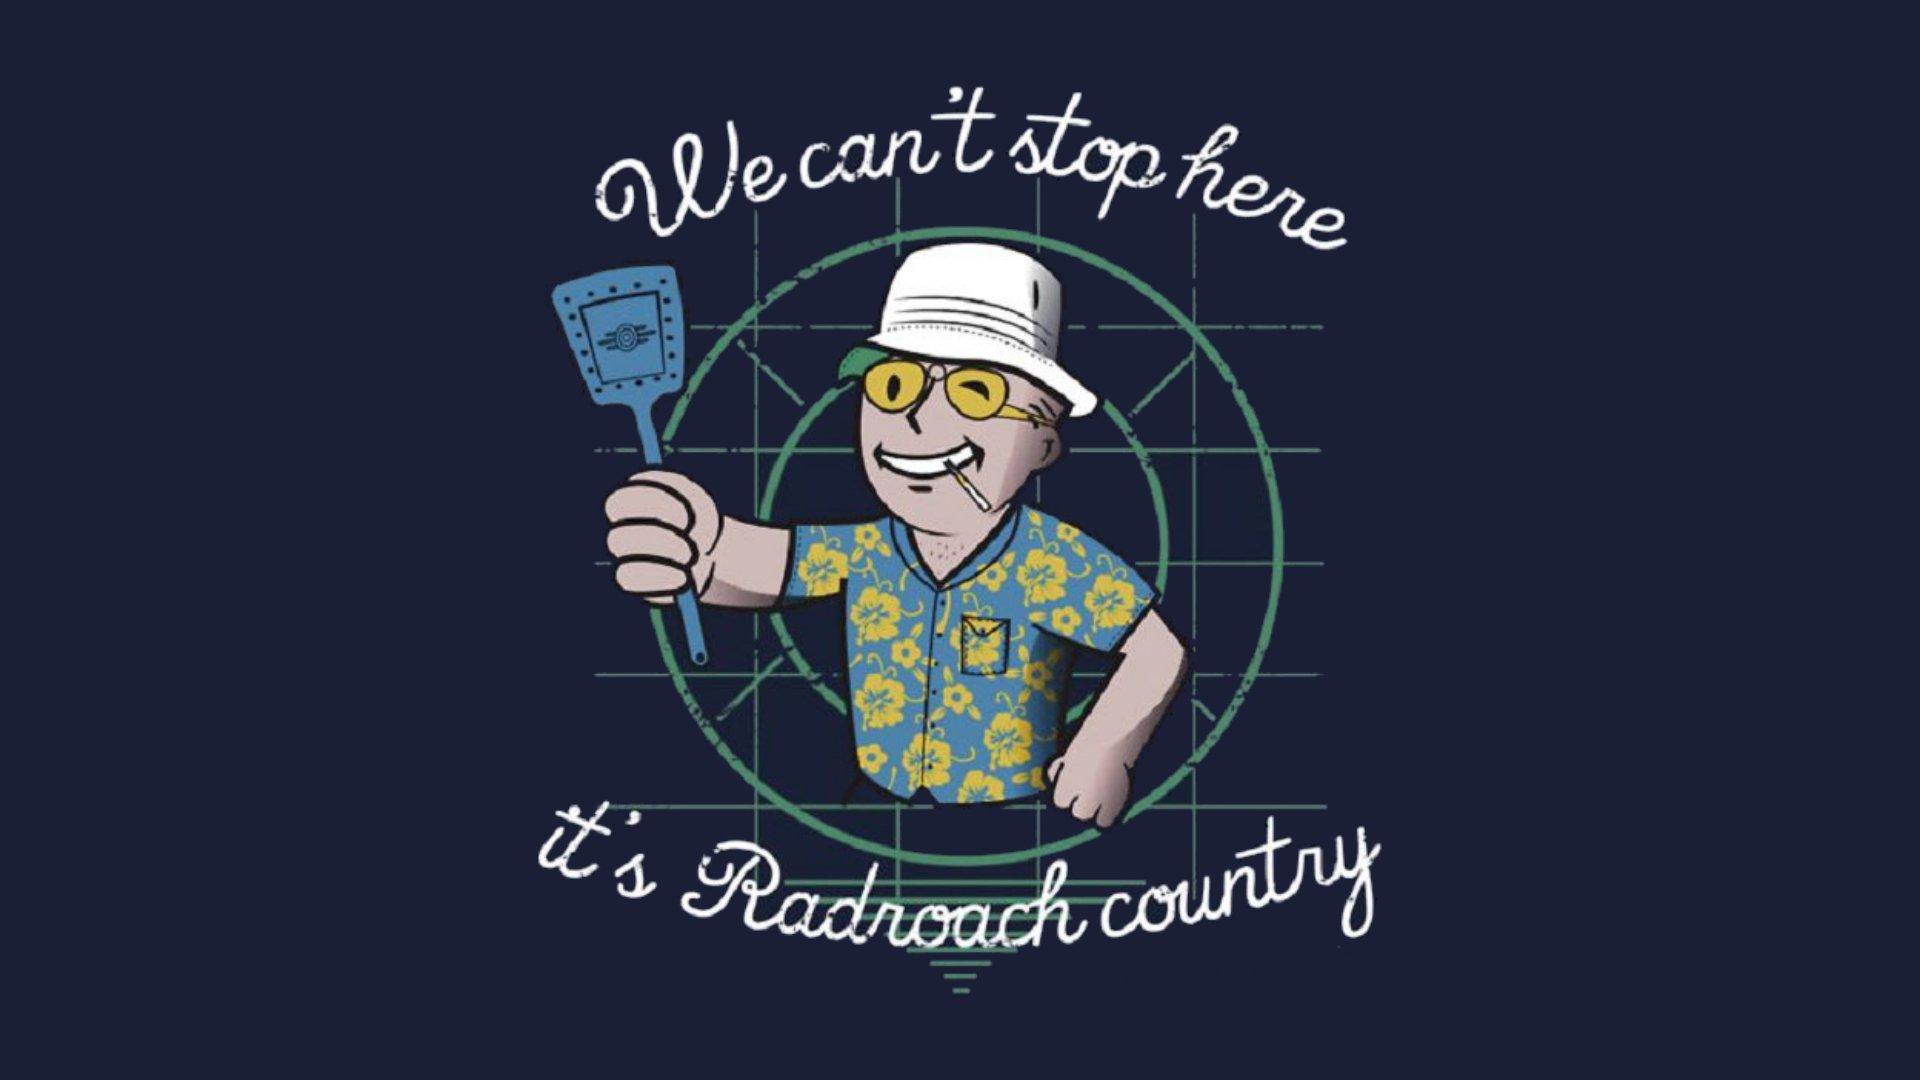 Gravity Falls Wallpaper Imgur Rad Roach Country Hd Wallpaper Background Image